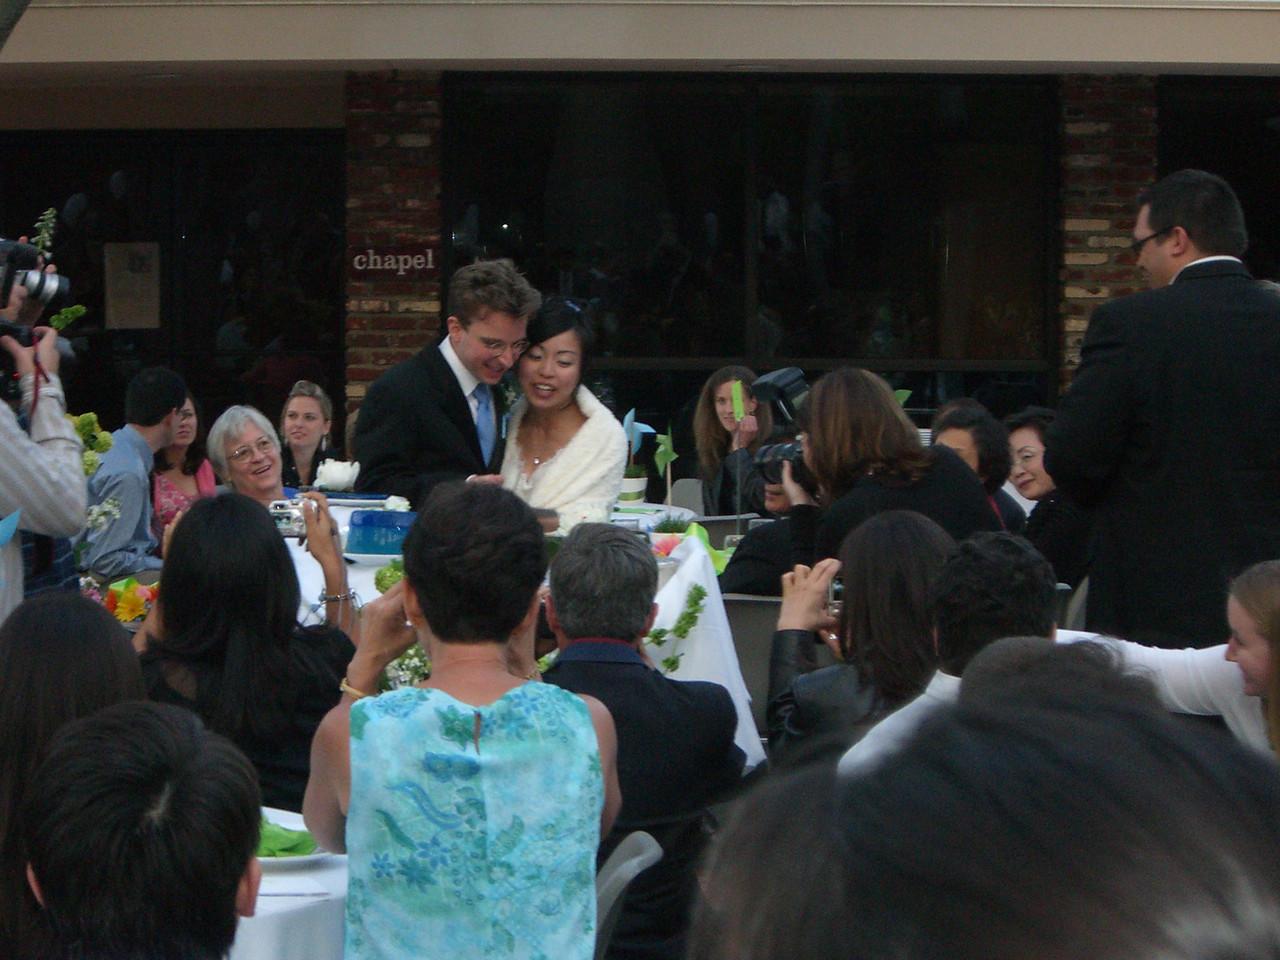 2006 05 06 Sat - Tim & Isabel cut the Jello wedding cake